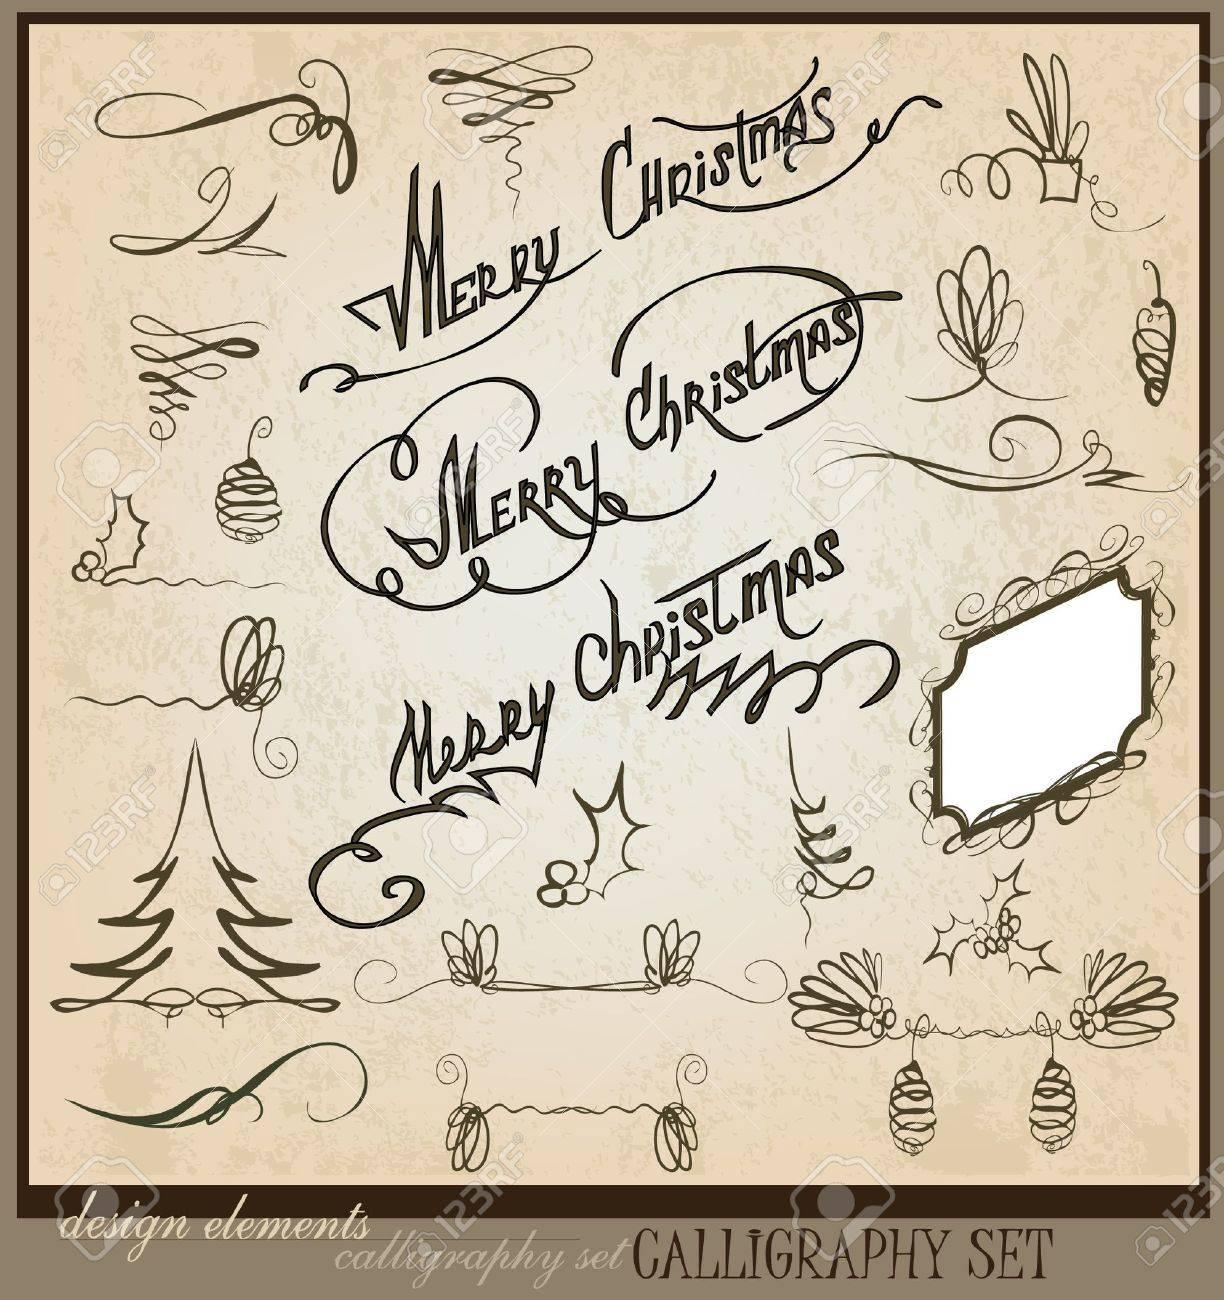 Merry Christmas calligraphic set Stock Vector - 10708336